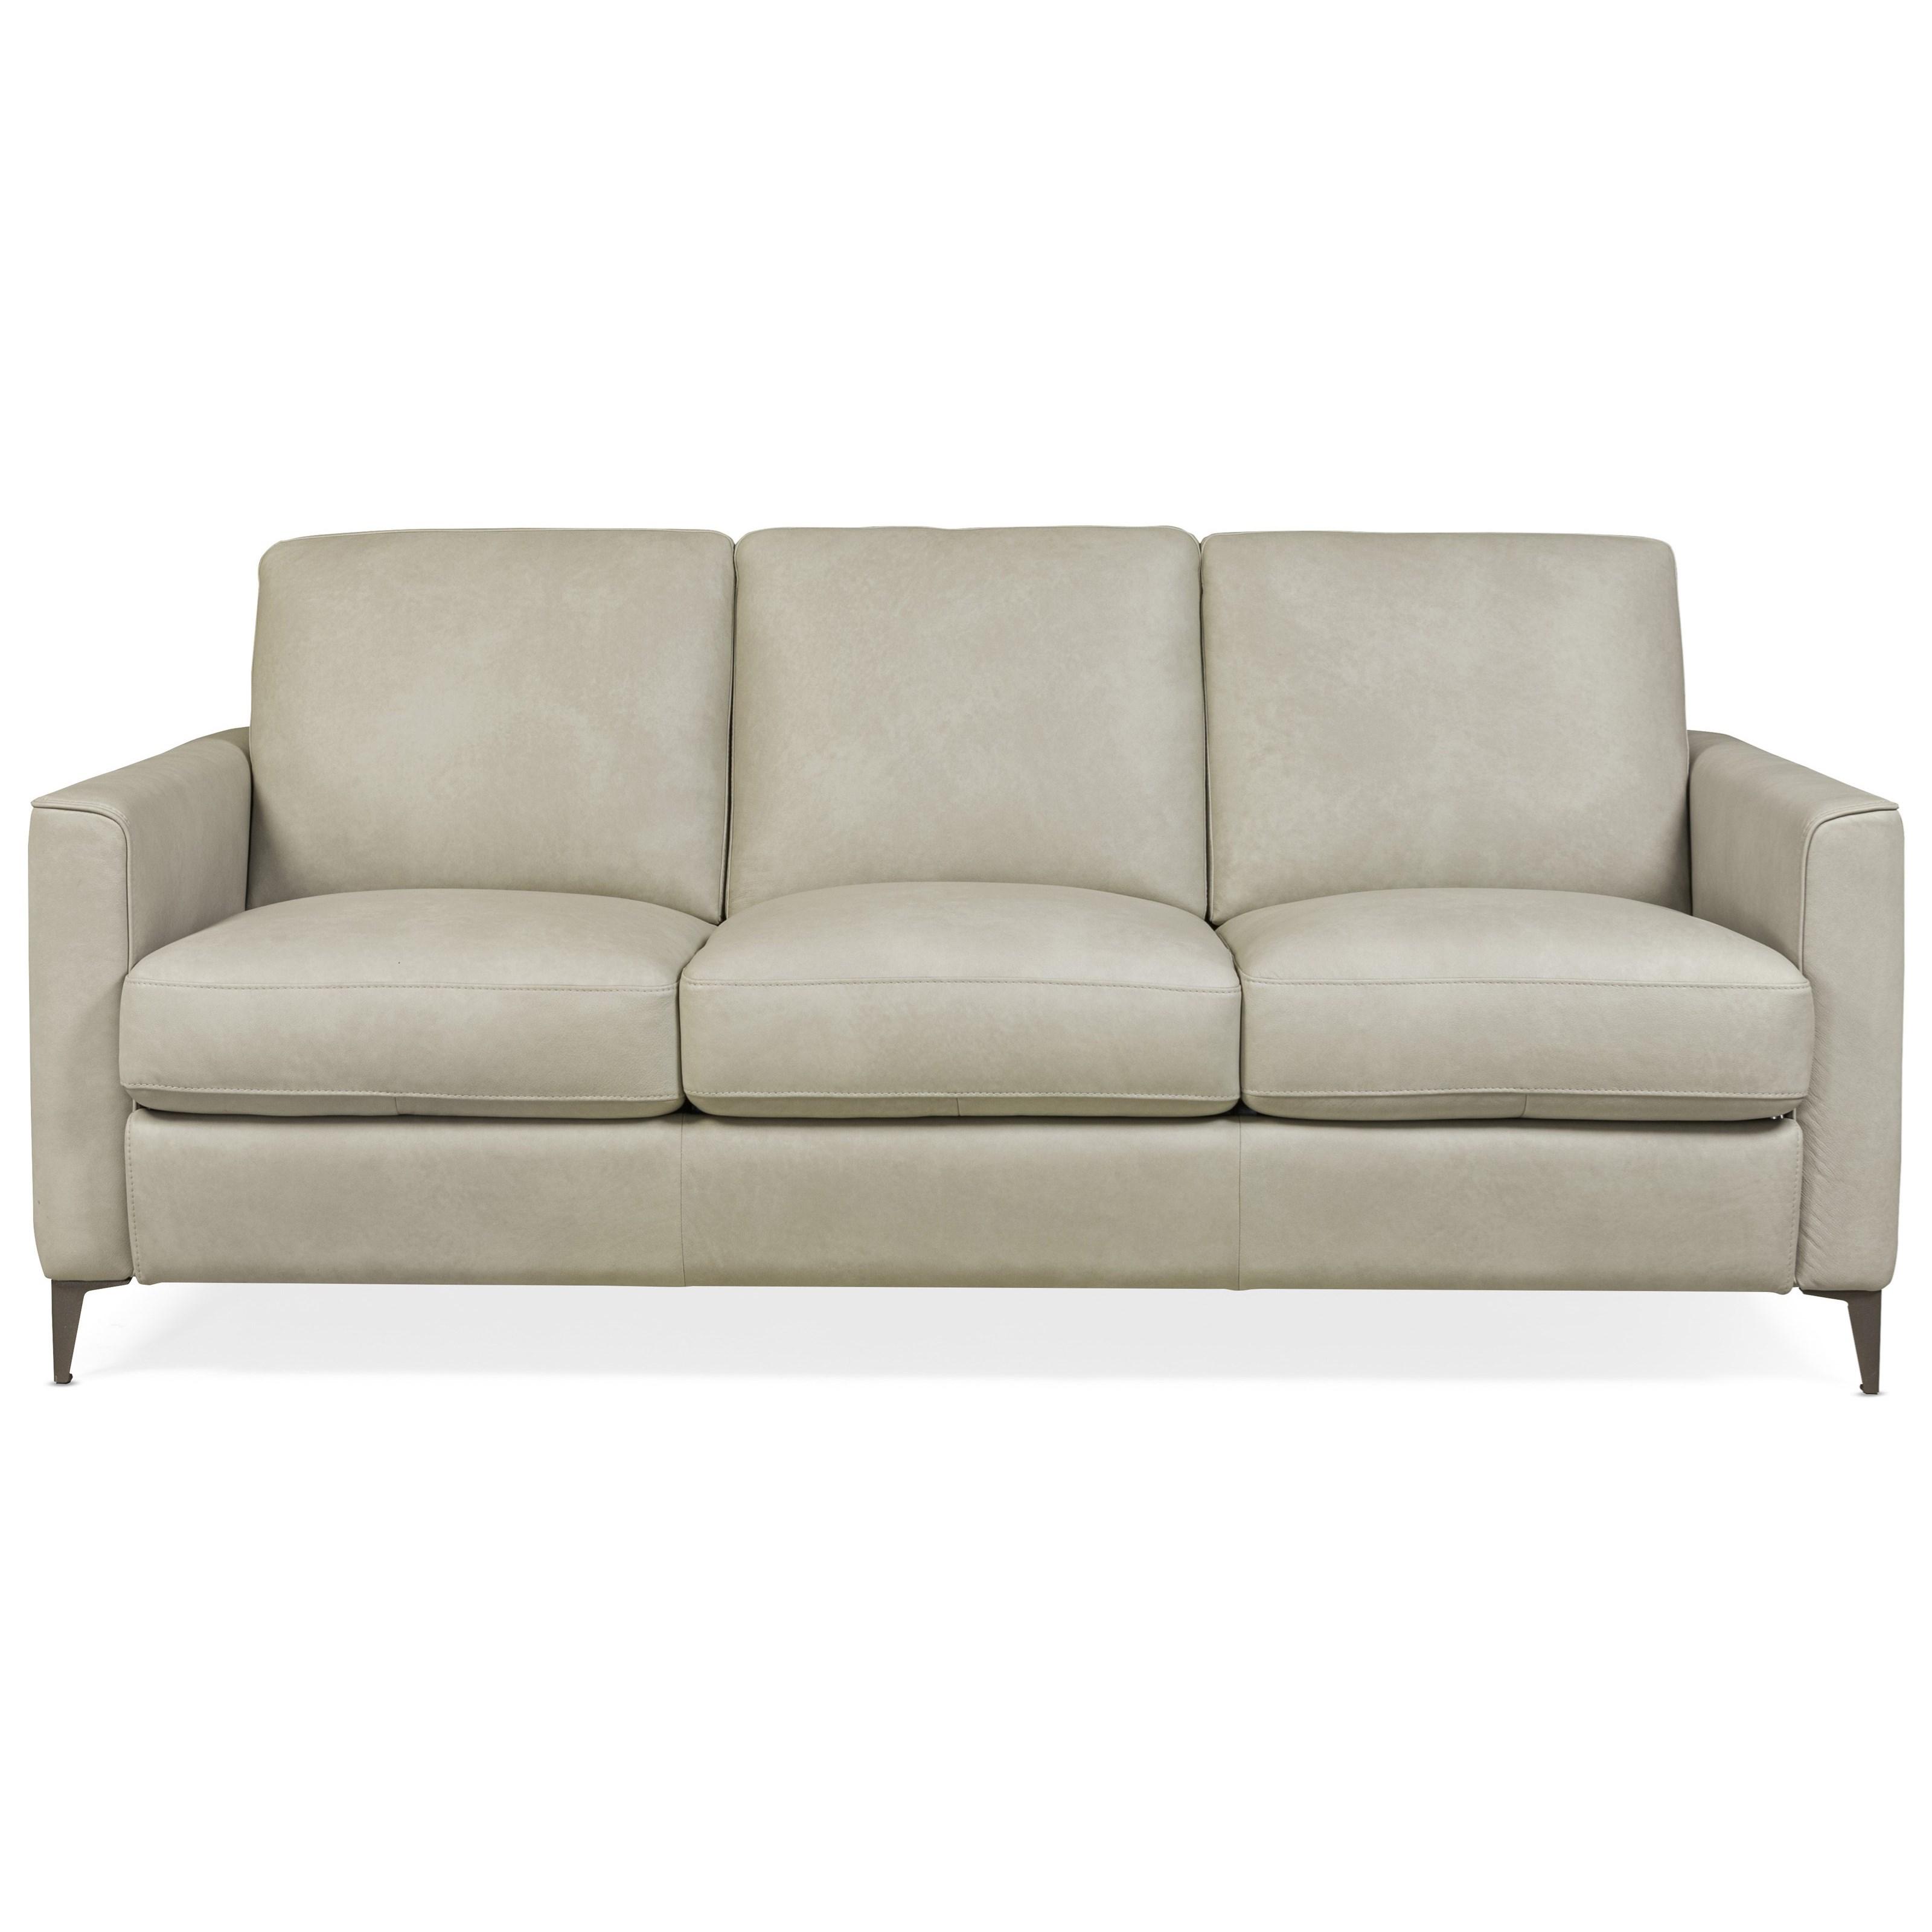 - Hooker Furniture Gresham Park Contemporary 81 Inch Leather Sleeper